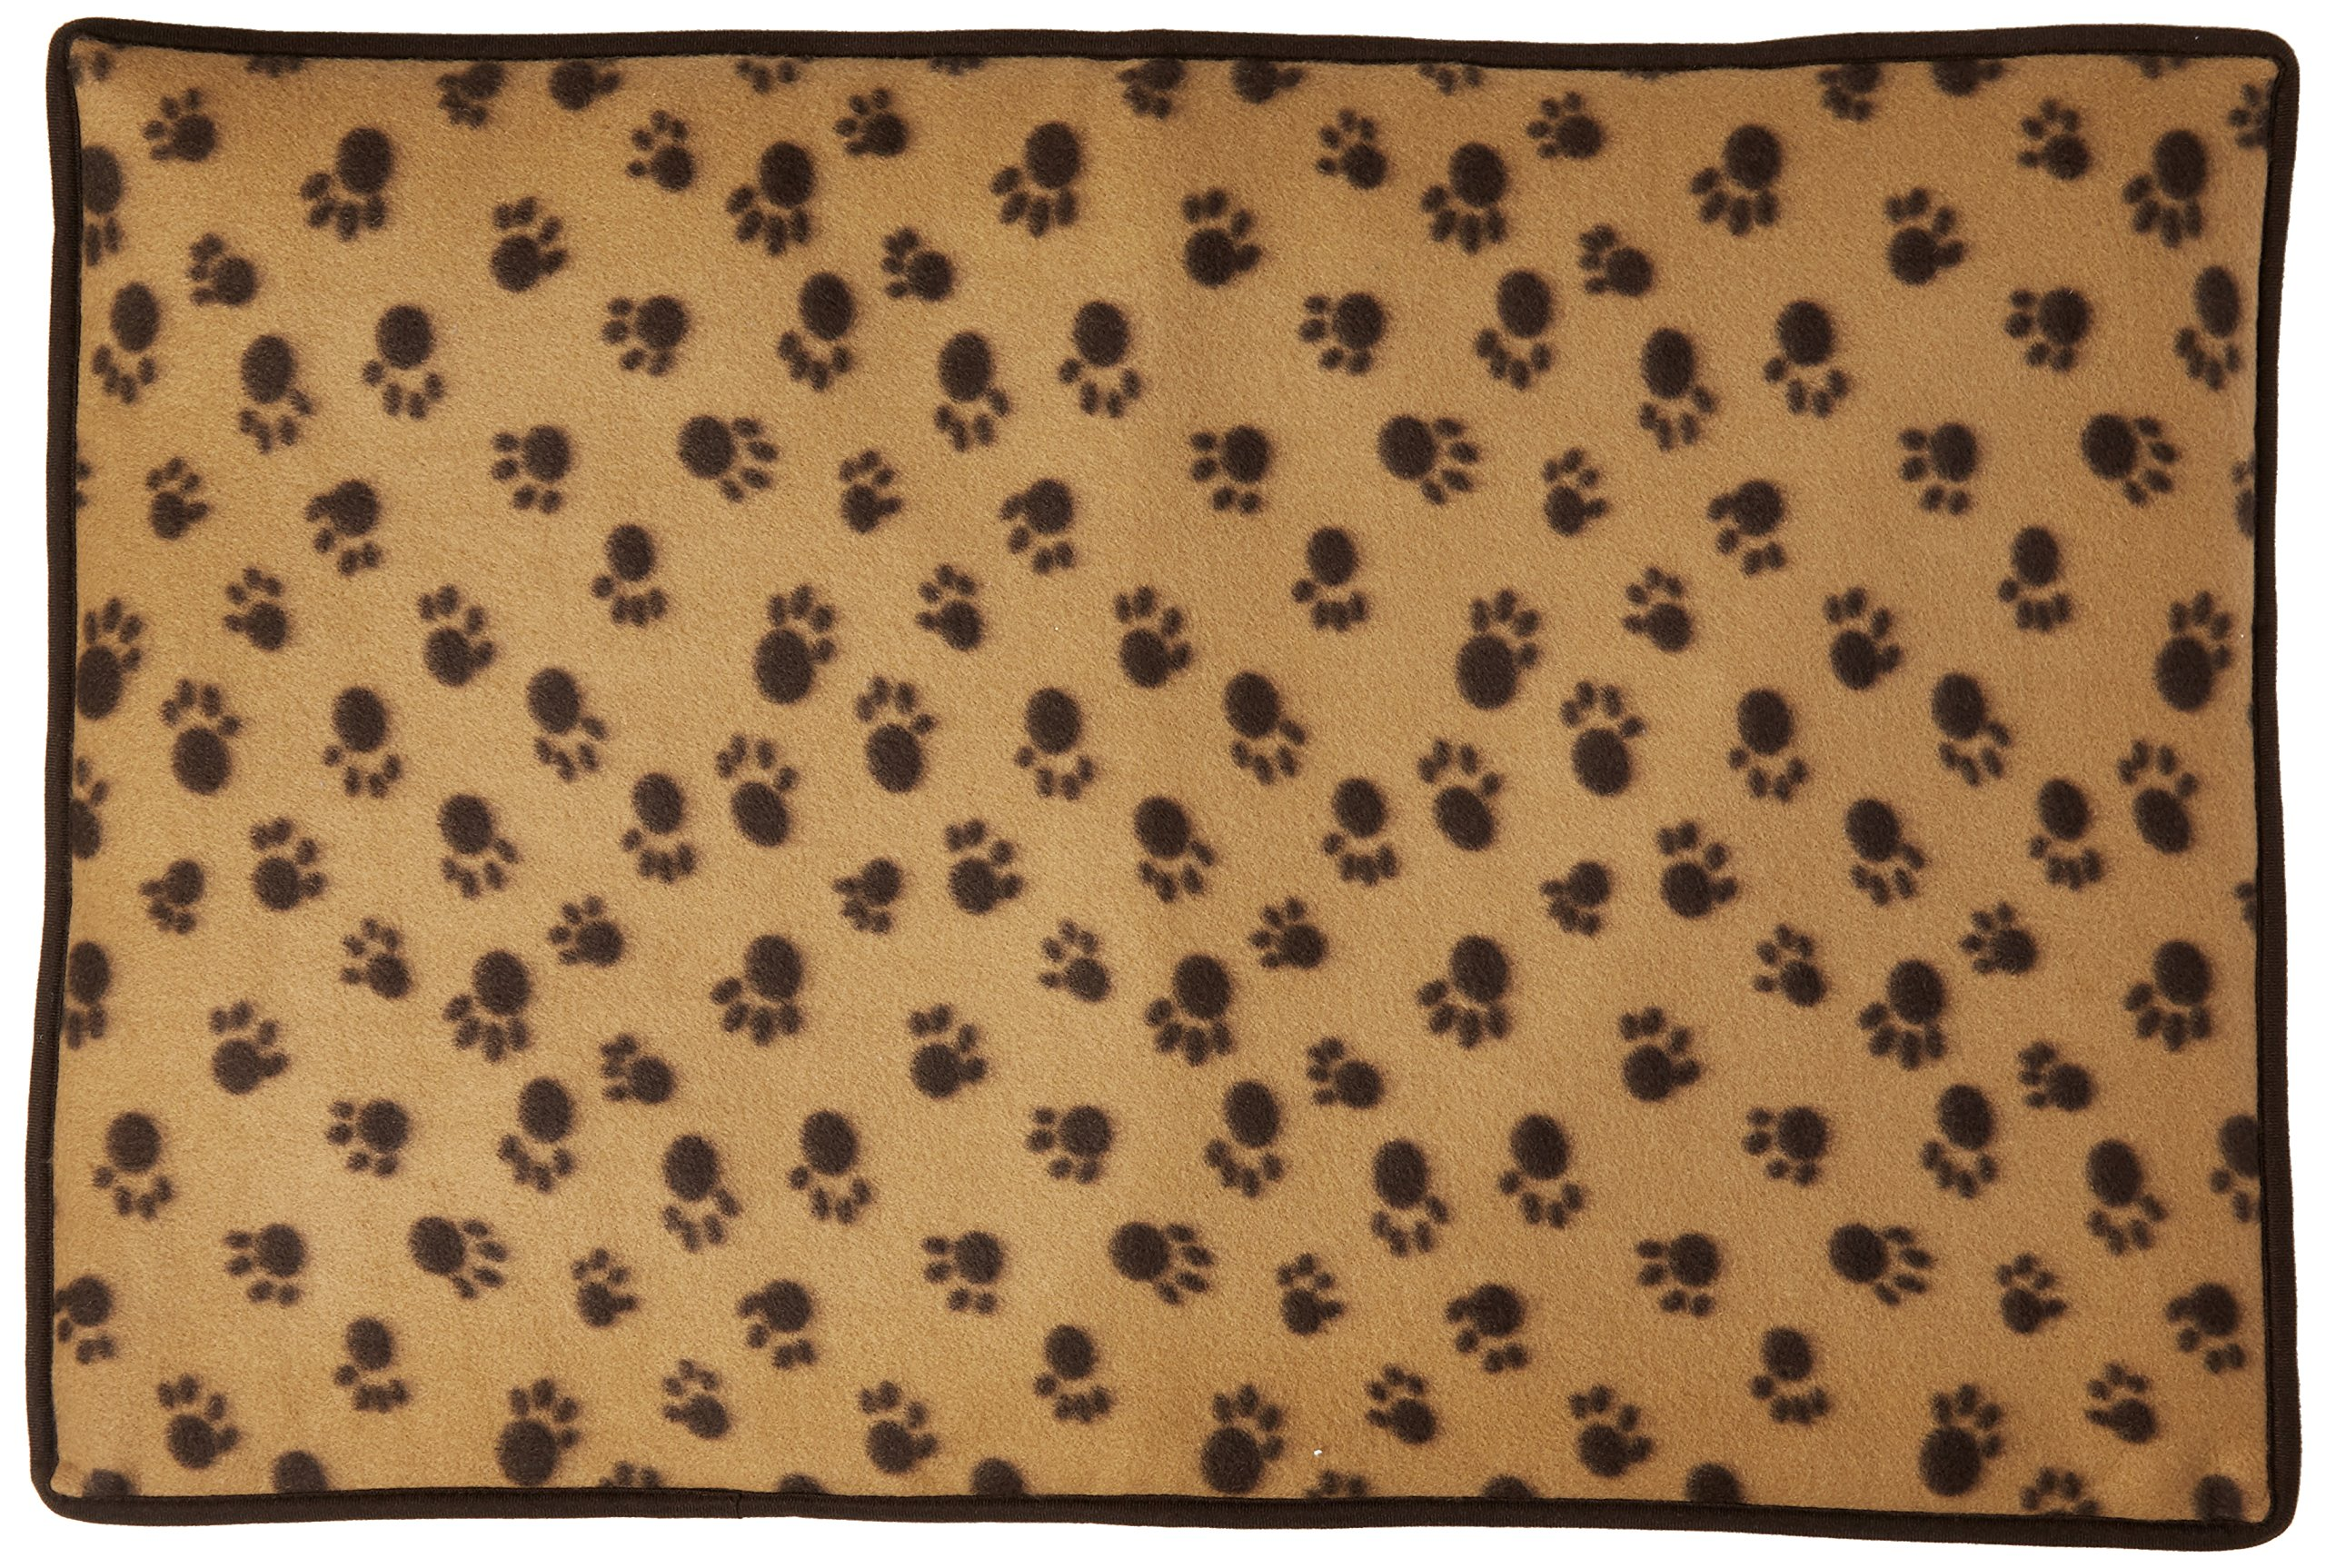 PU Health Soft Dog Paw Print Fleece Blanket